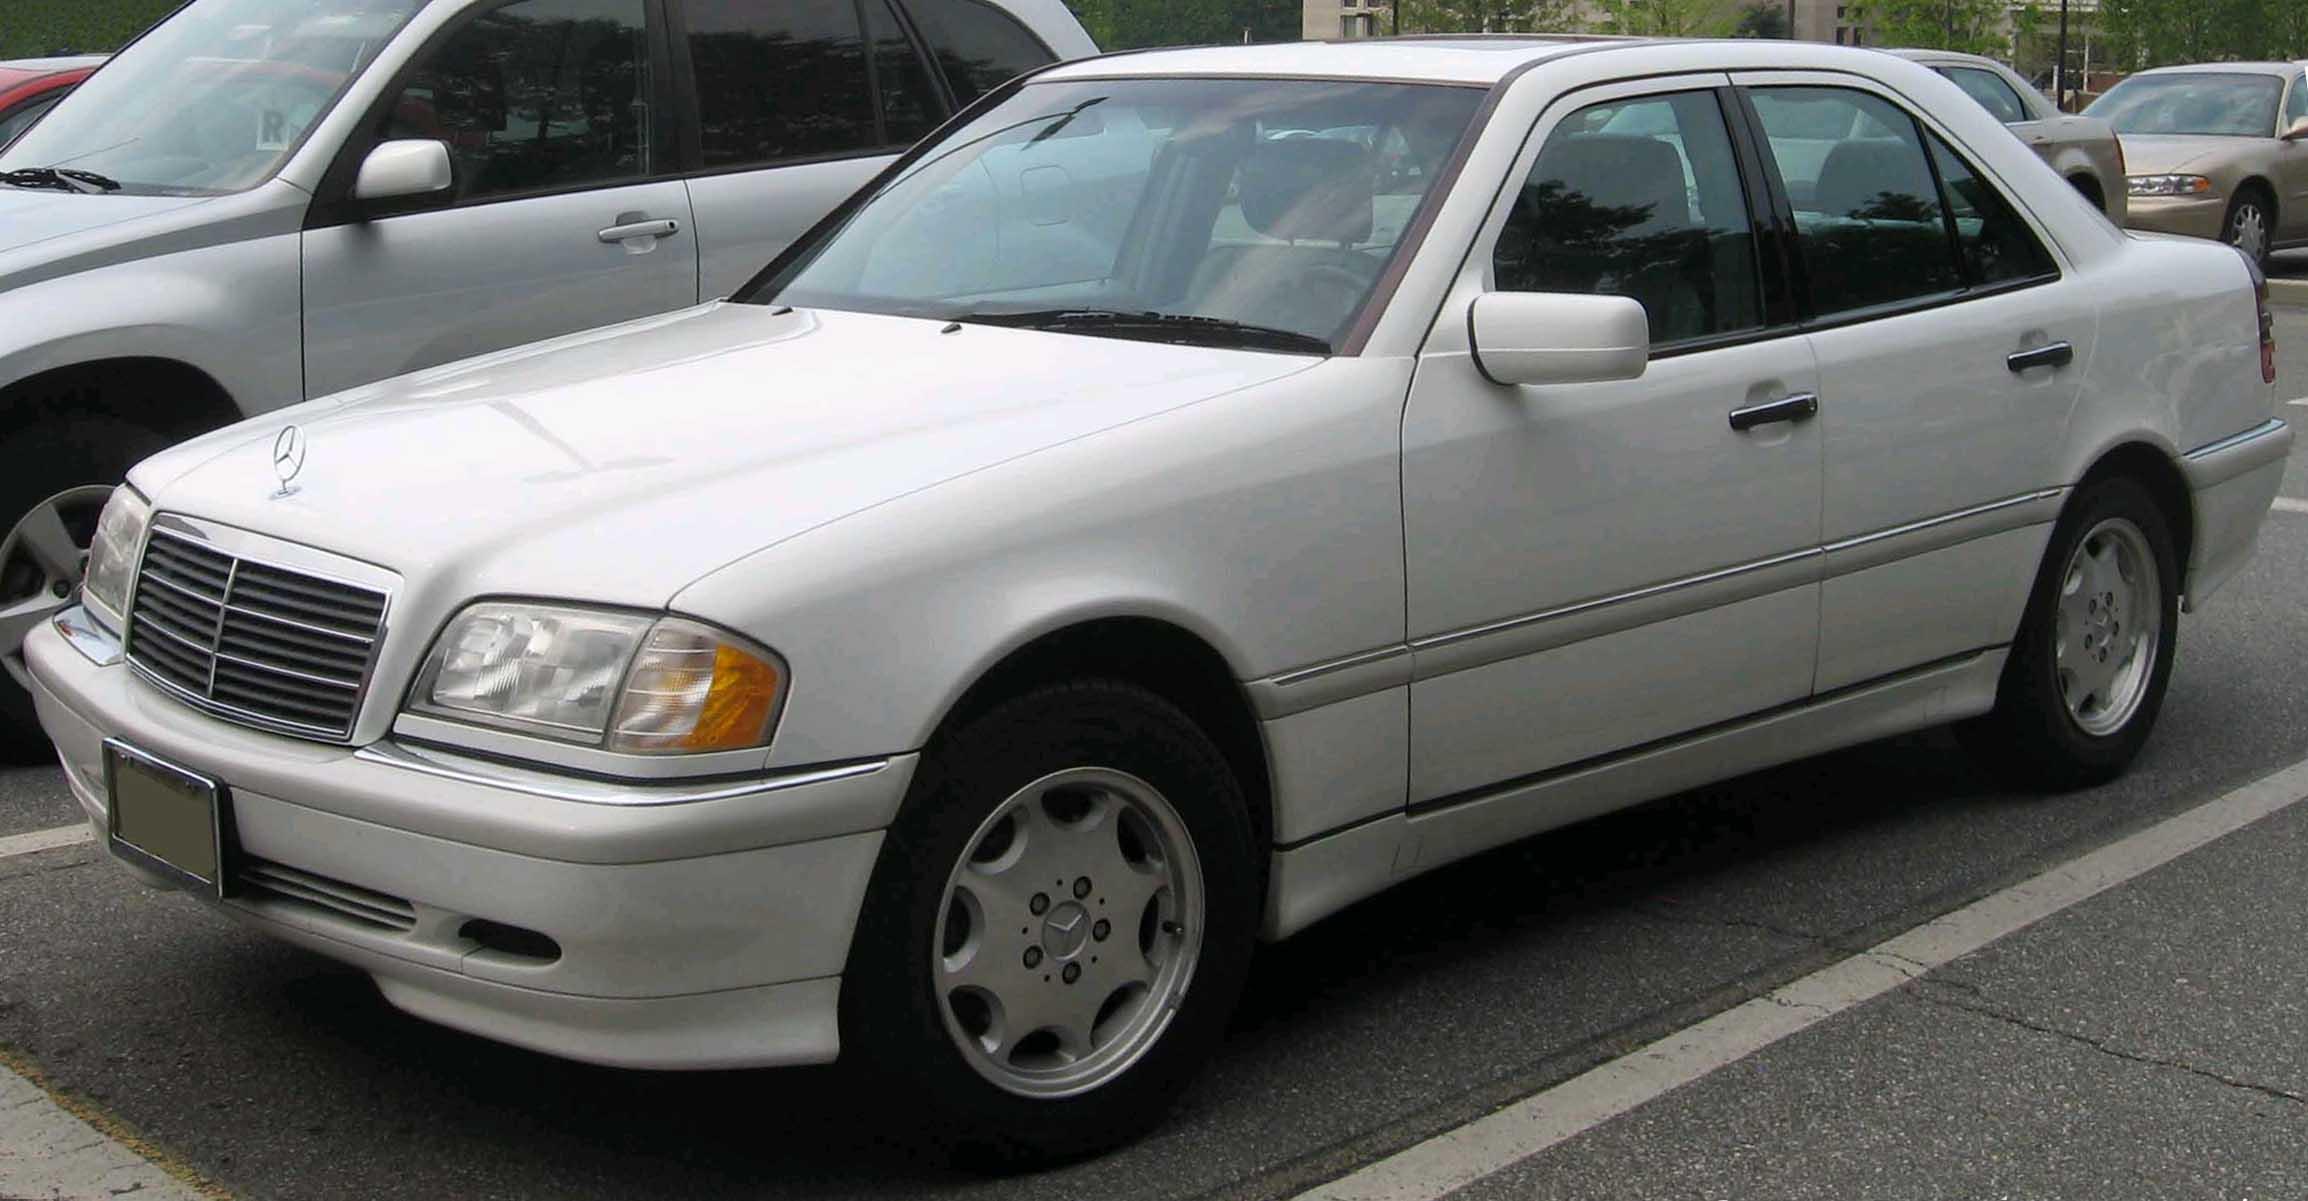 Mercedes-Benz W202 - Wikiwand